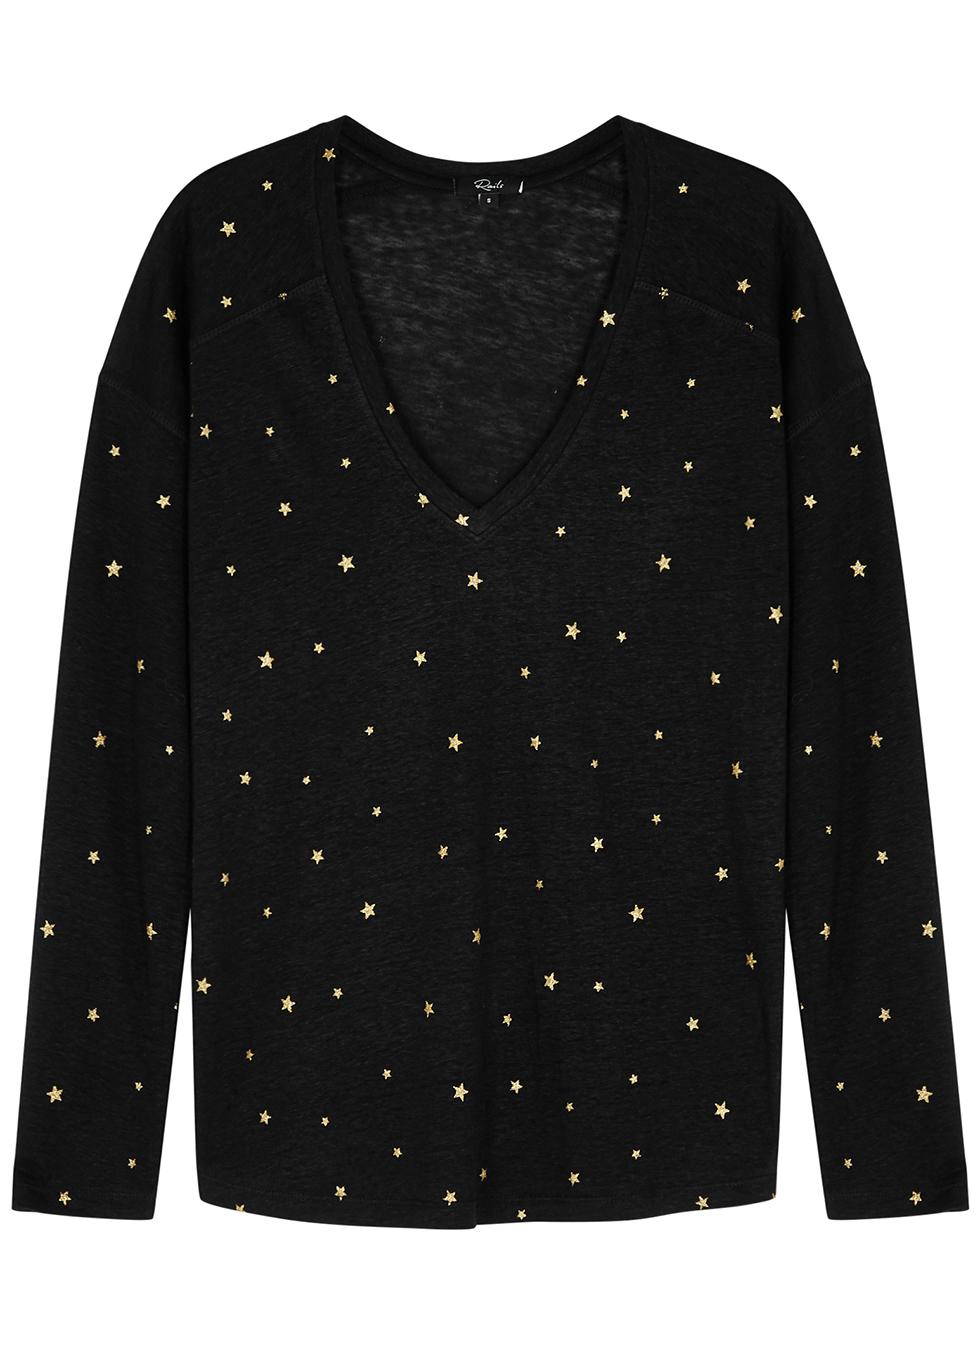 Sami Star-Print Linen-Blend Top in Black